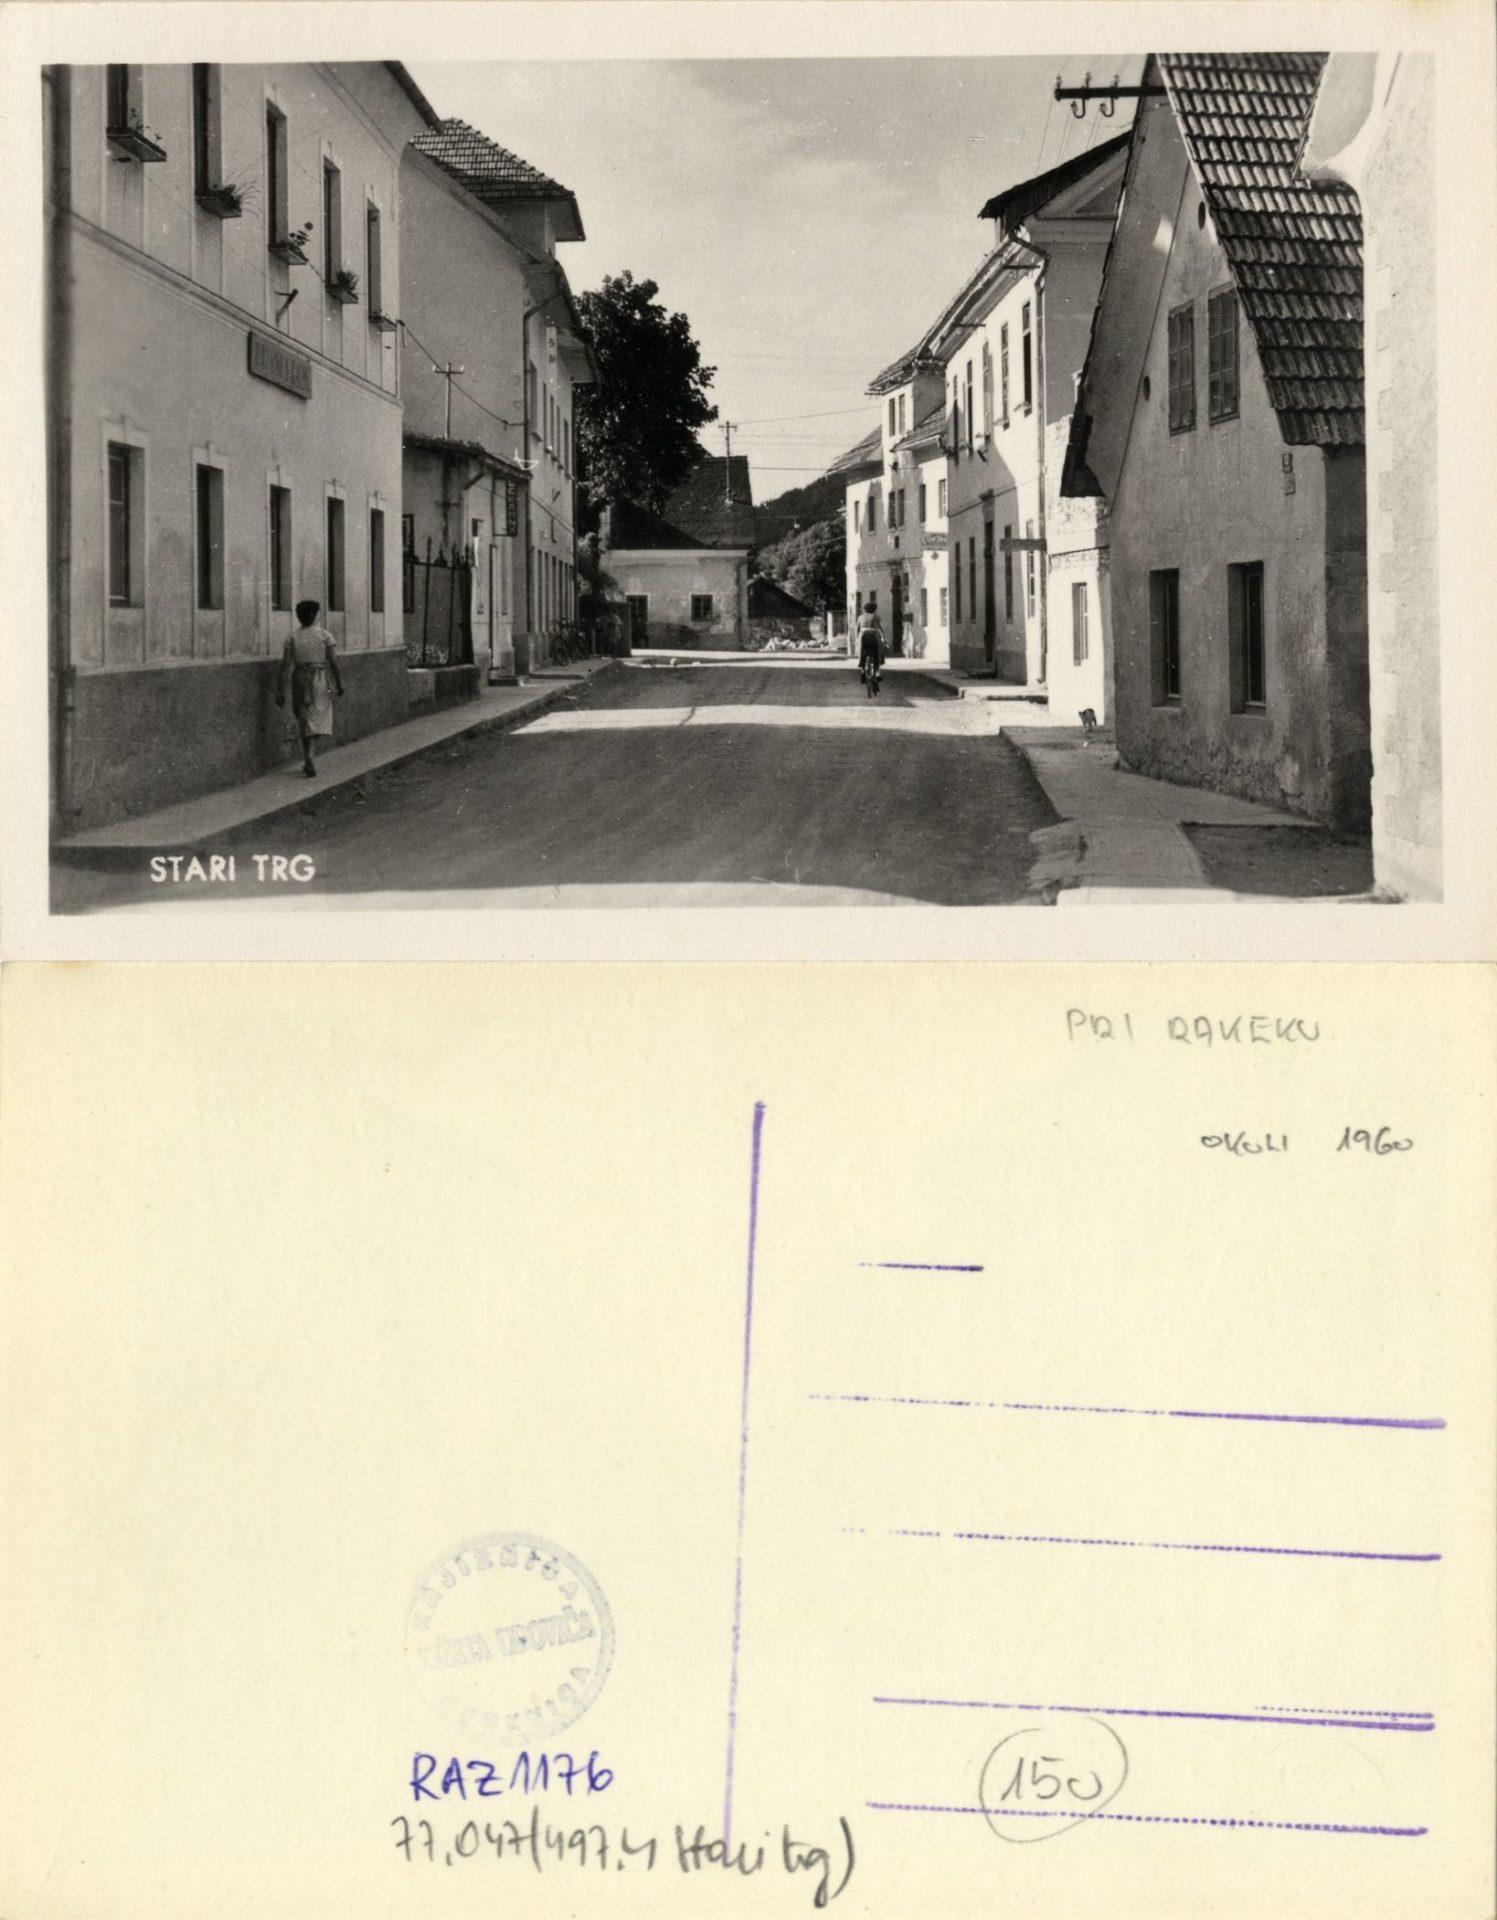 zlimano 170 - Stari trg